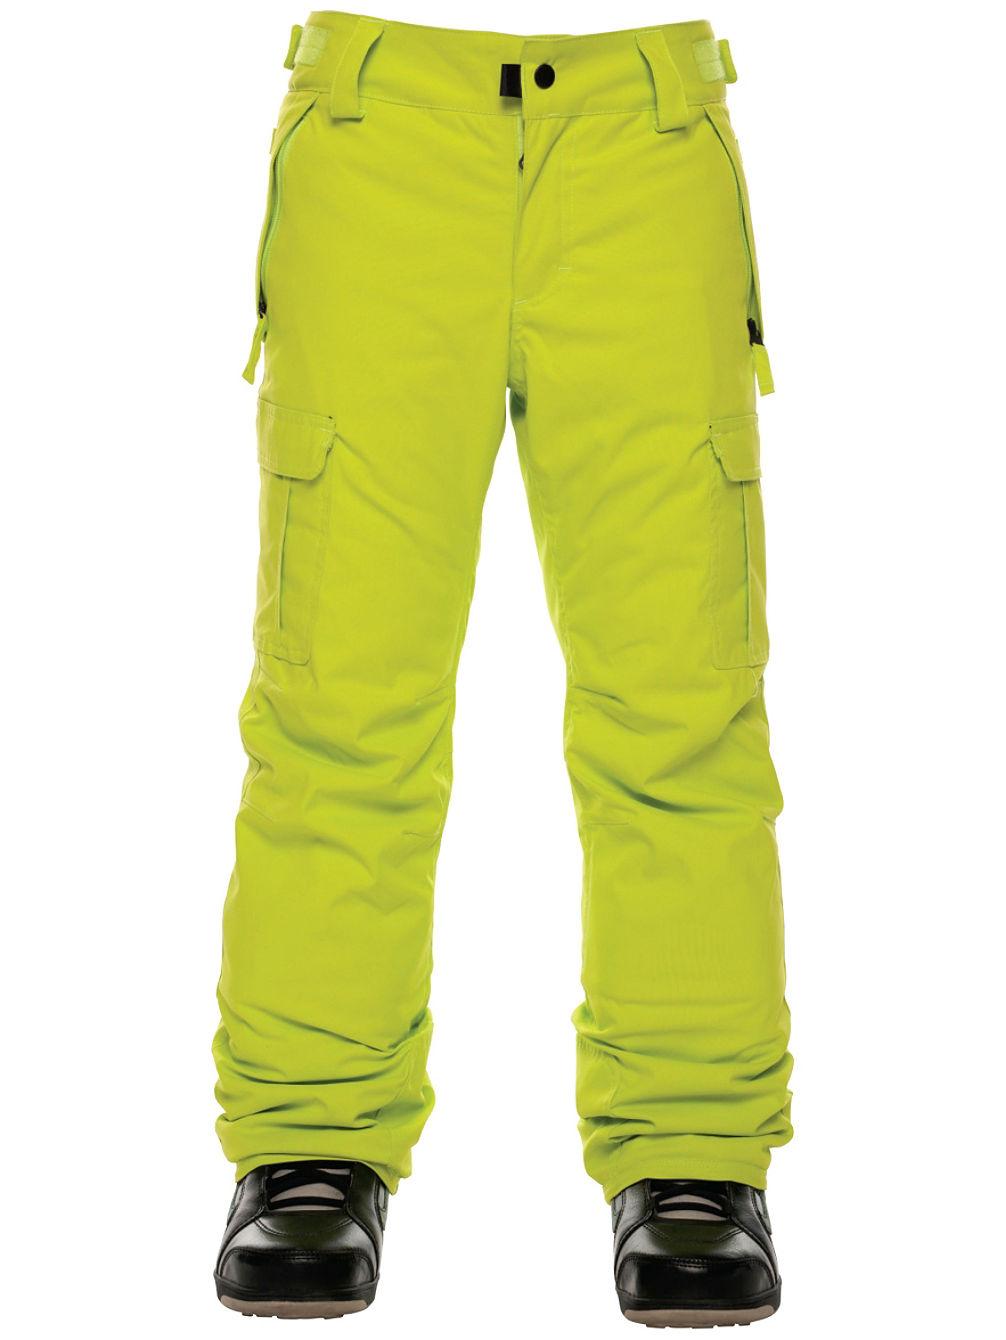 16990de9 Buy 686 All Terrain Insulator Pants Boys online at Blue Tomato